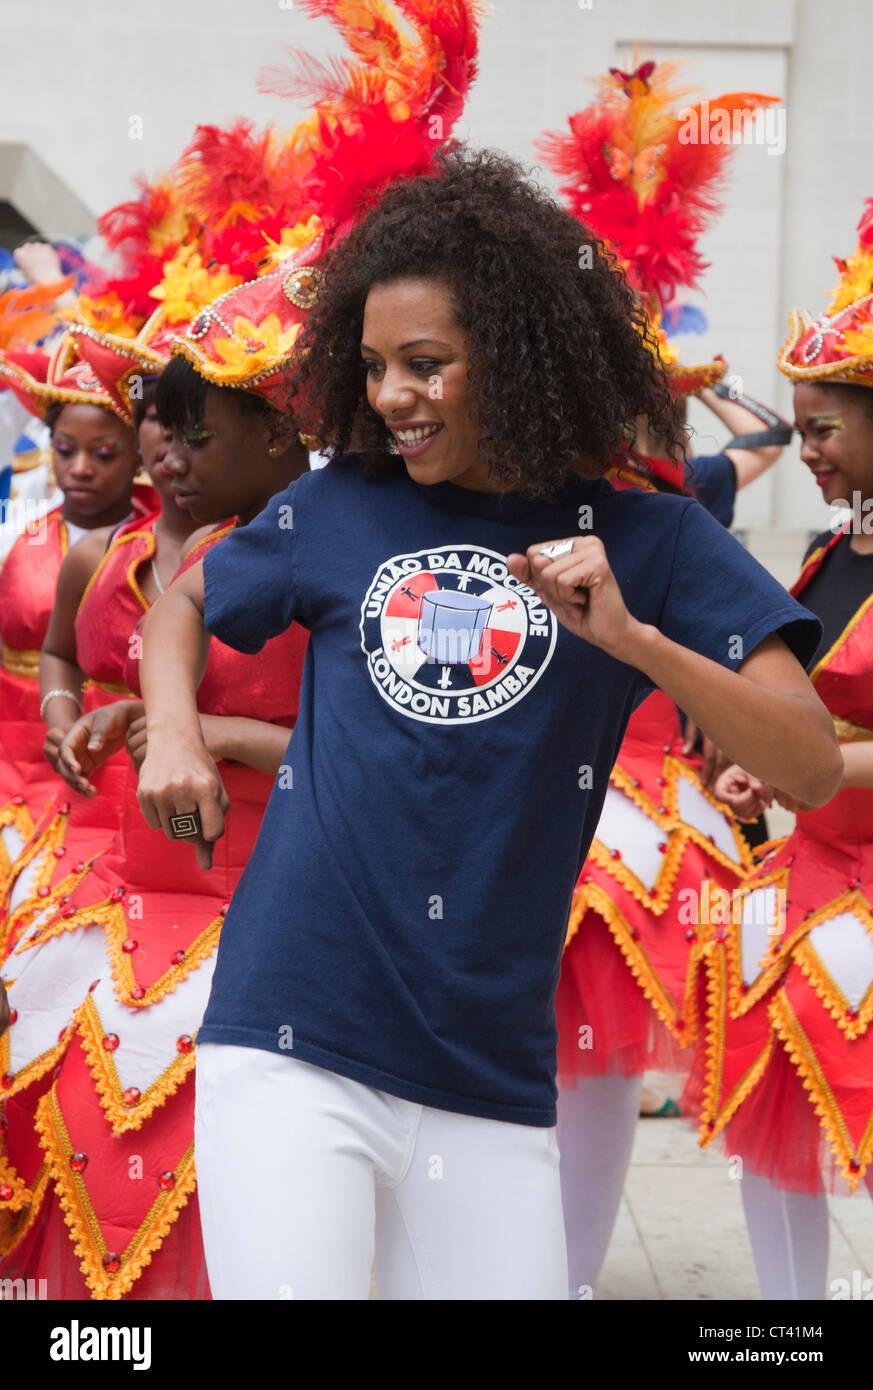 Uniao da Mocidade, London-based Brazilian style Samba group, City of London Festival, Flowers of the World Parade - Stock Image